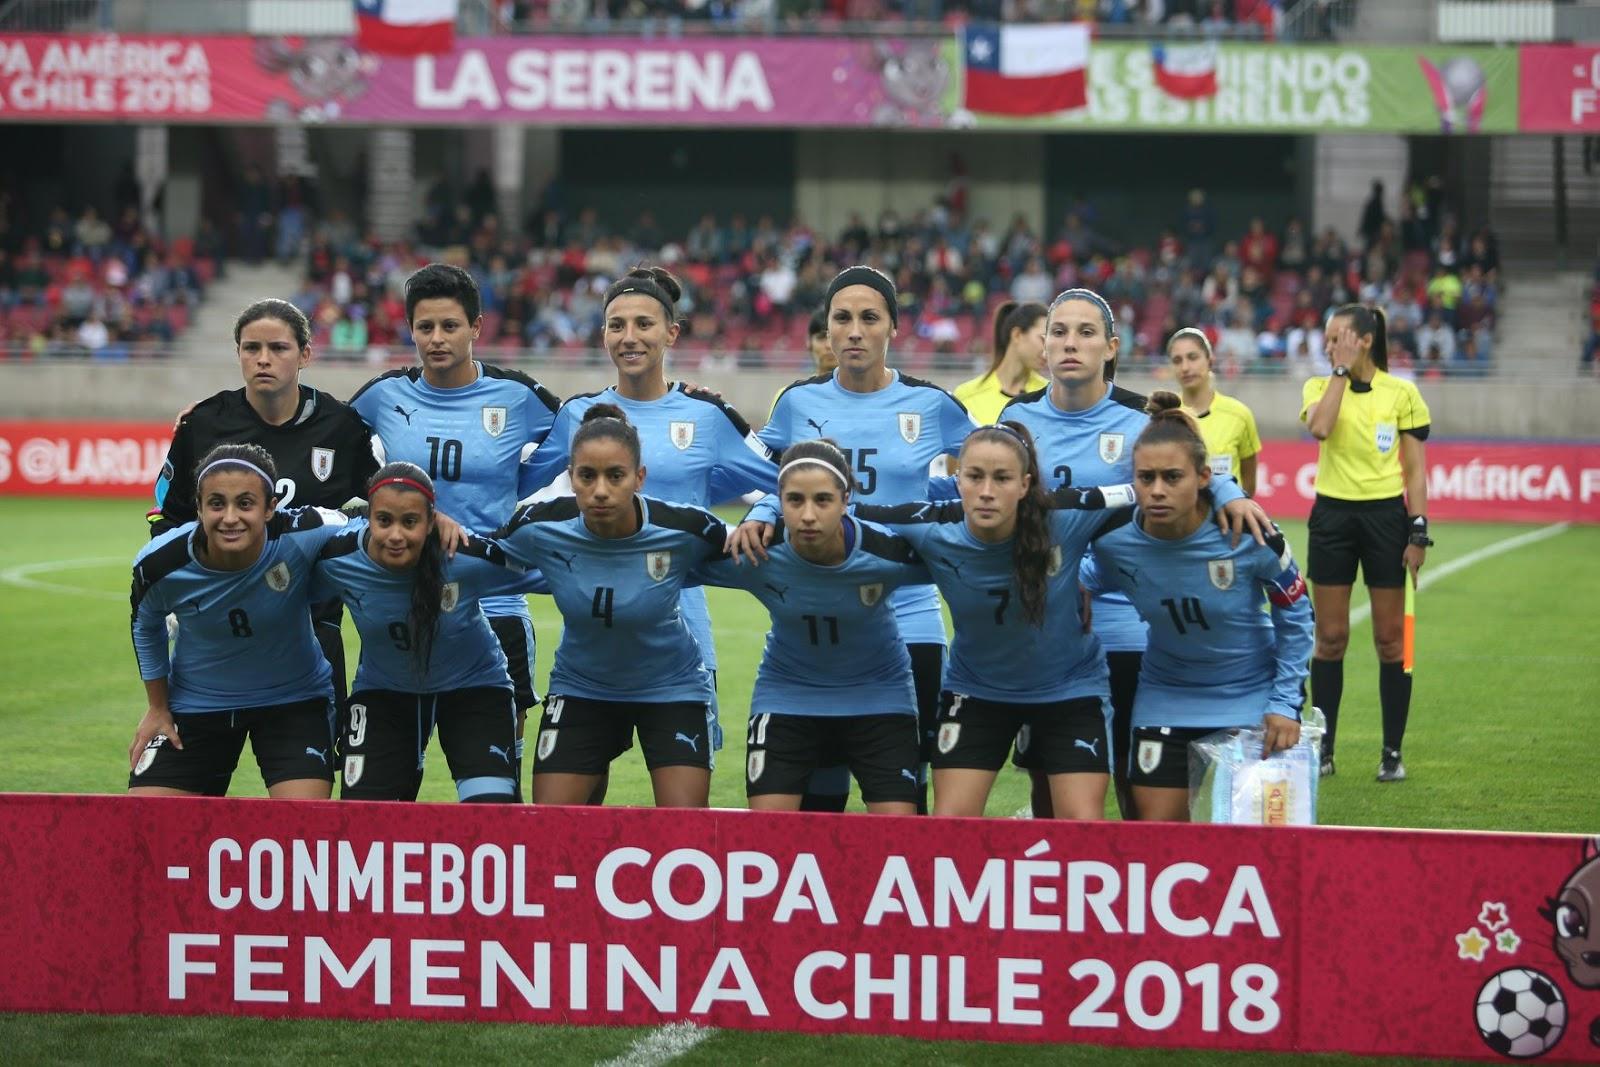 Formación de selección de Uruguay ante Chile, Copa América Femenina 2018, 10 de abril